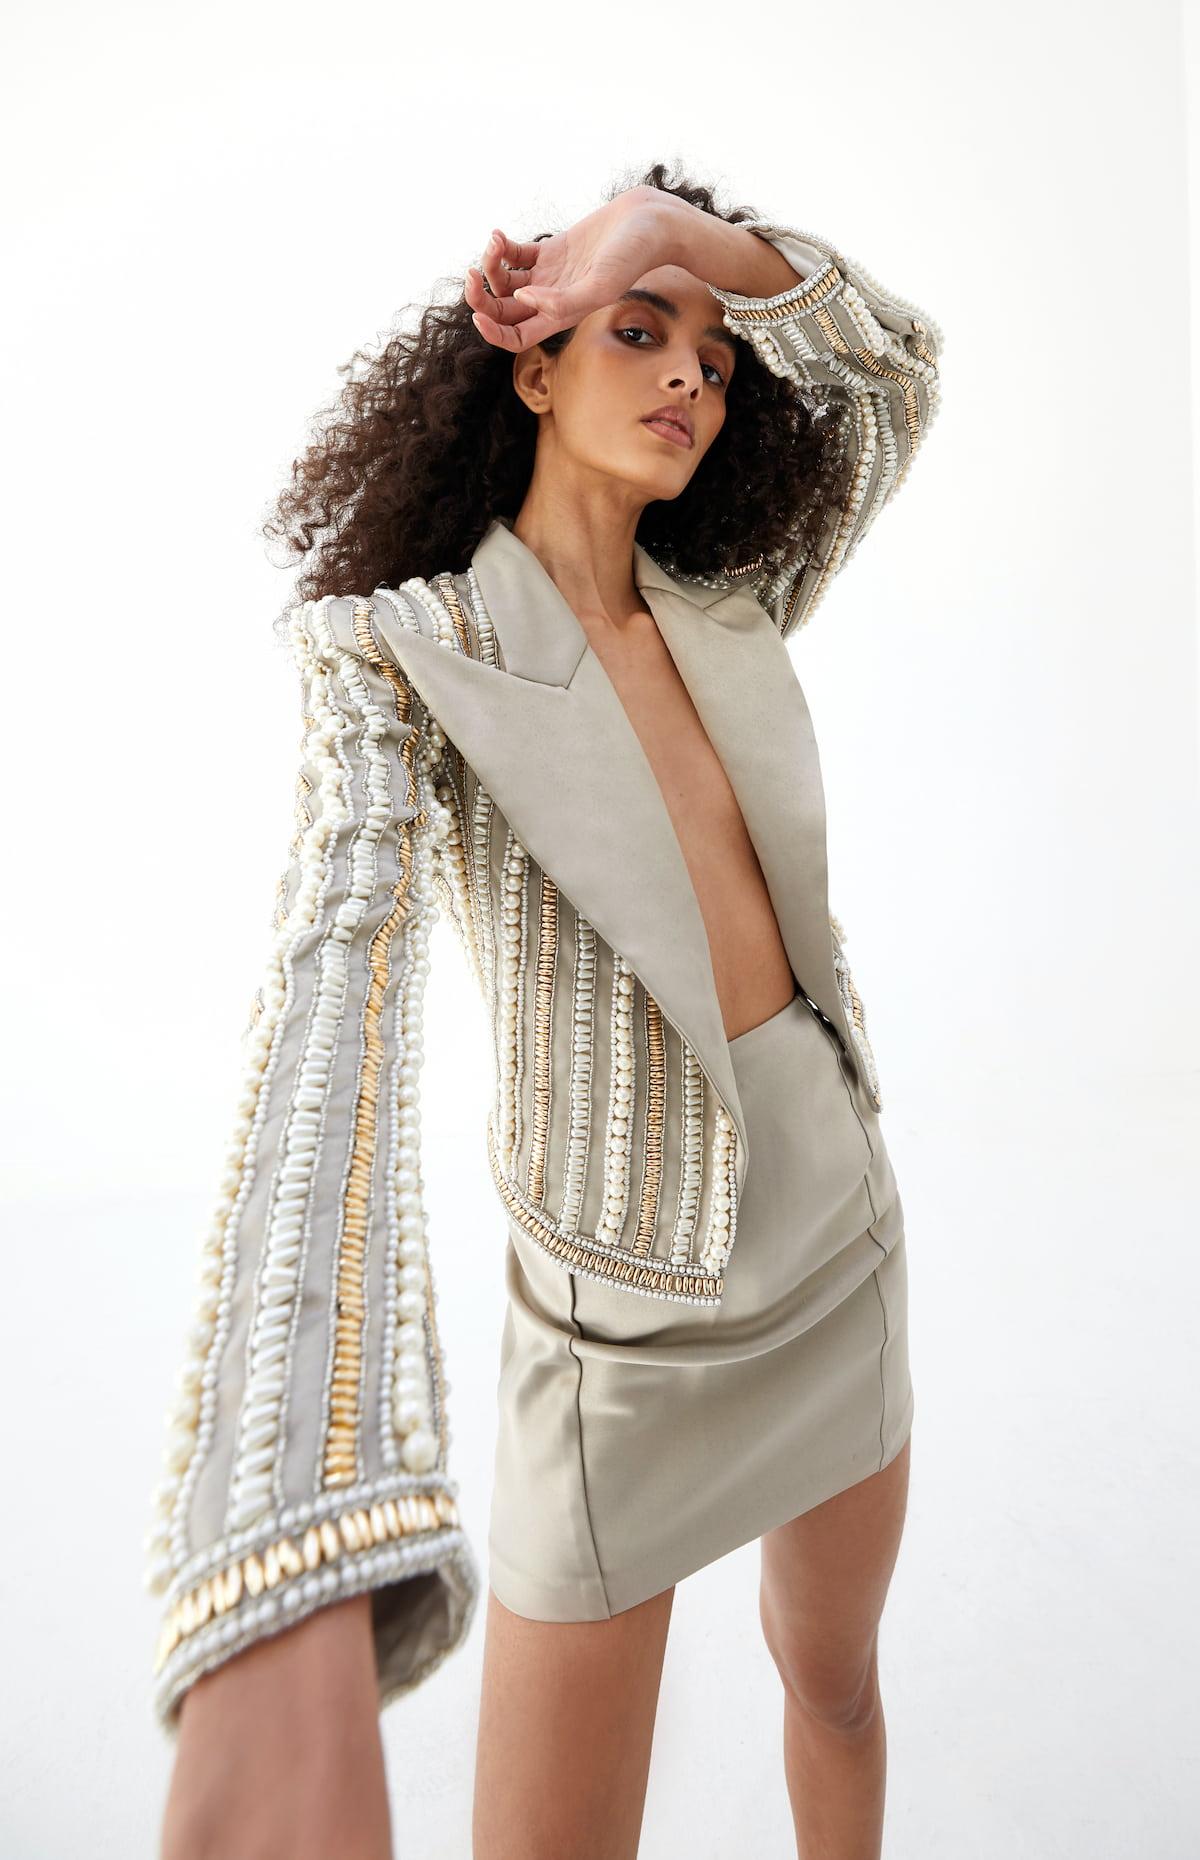 View 4 of model wearing Kaysa Blazer in pearl gold.